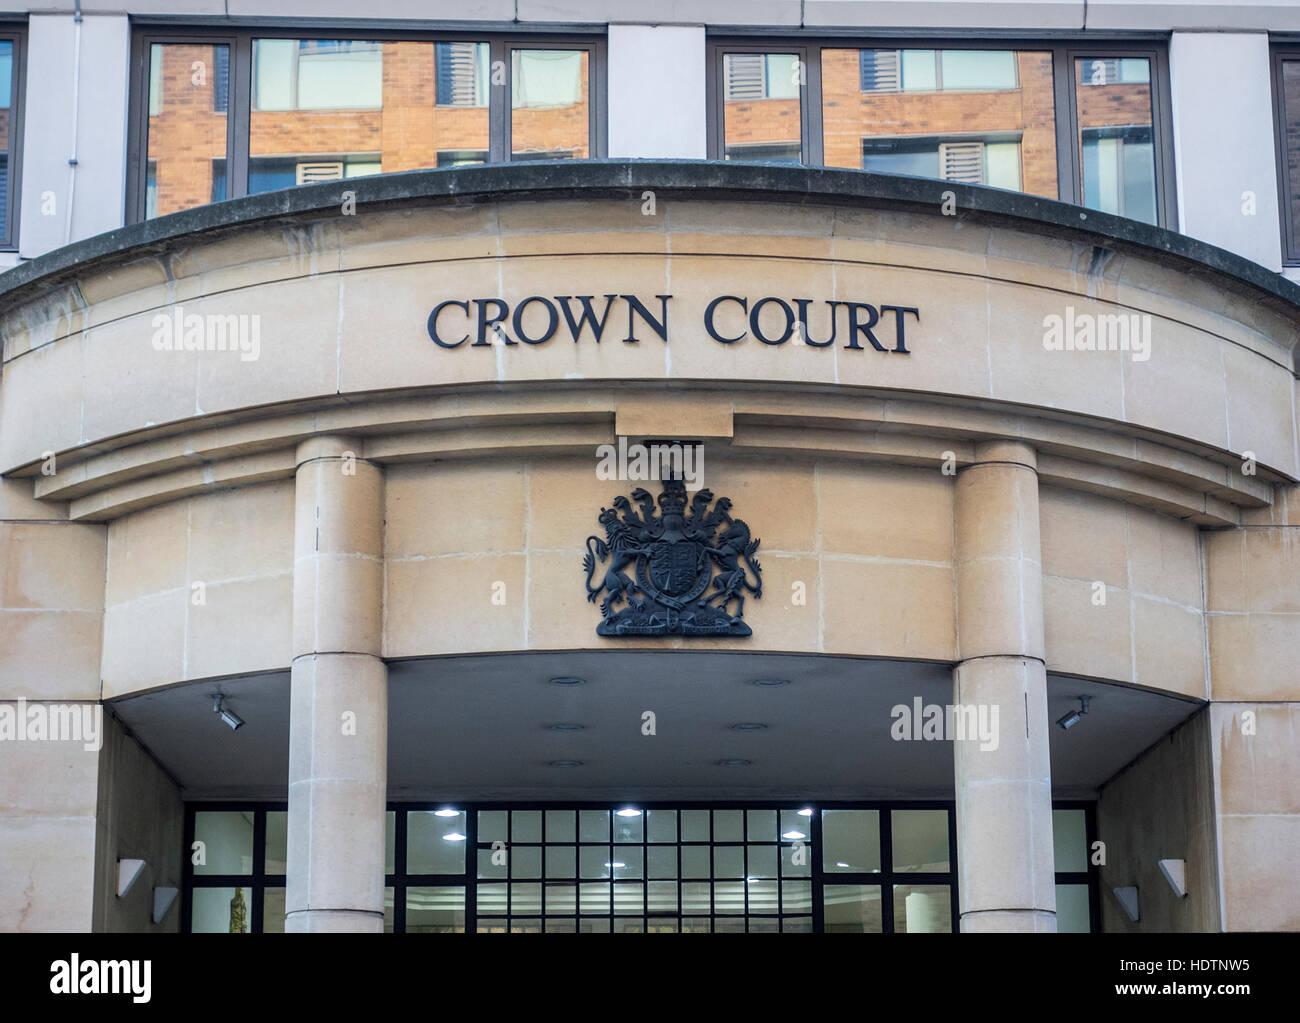 Blackfriars Crown Court, London, UK - Stock Image